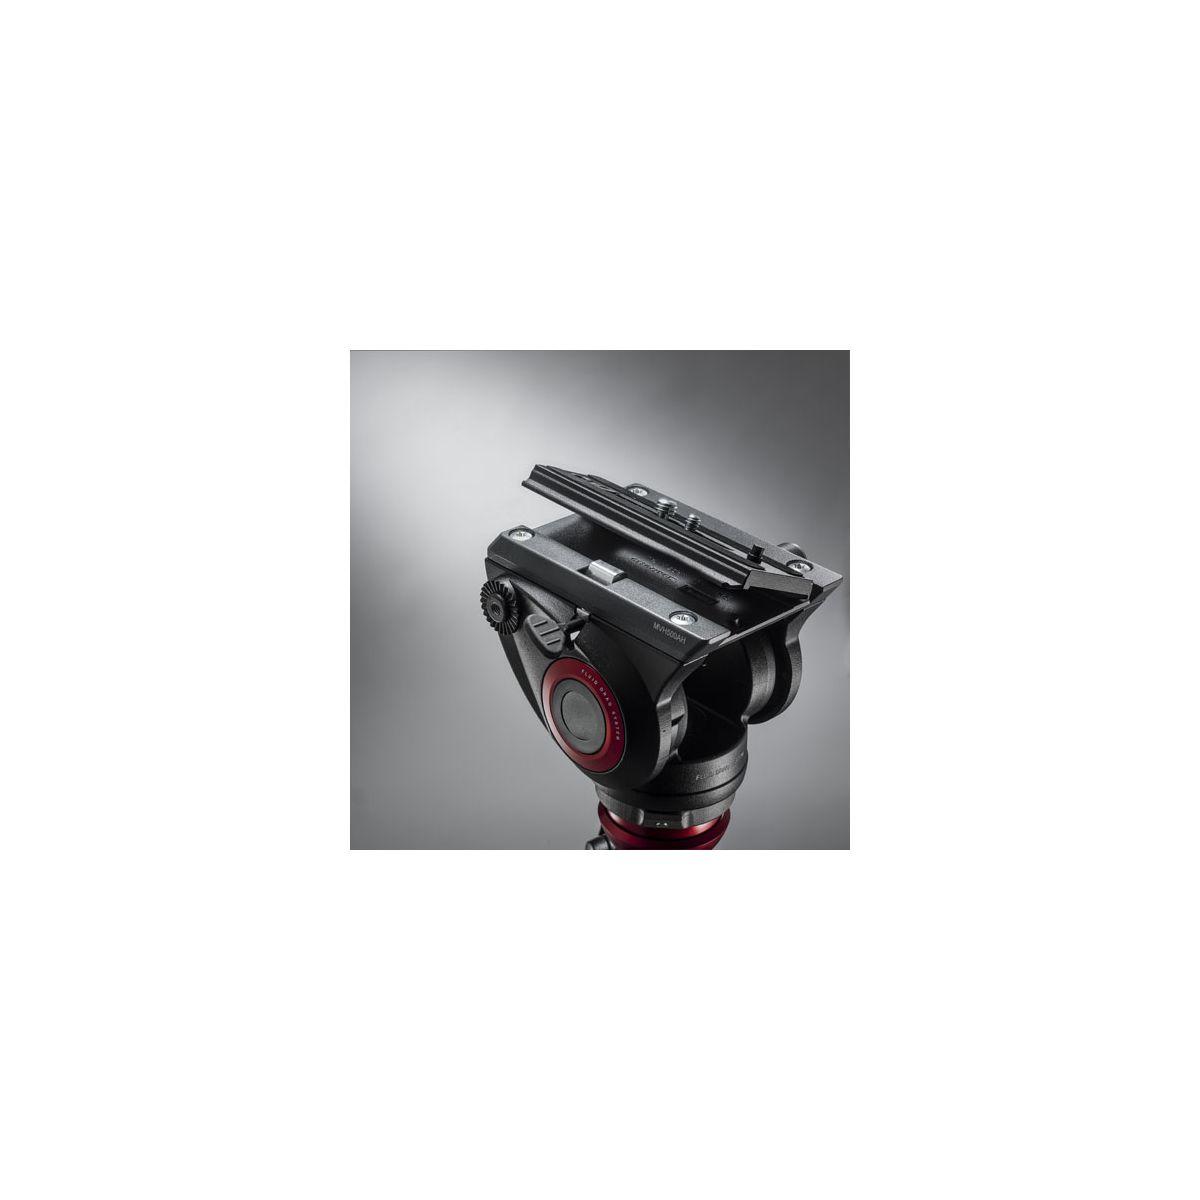 Tr�pied manfrotto kit 500, trepied vid�o double branche mv - 5% de remise imm�diate avec le code : wd5 (photo)